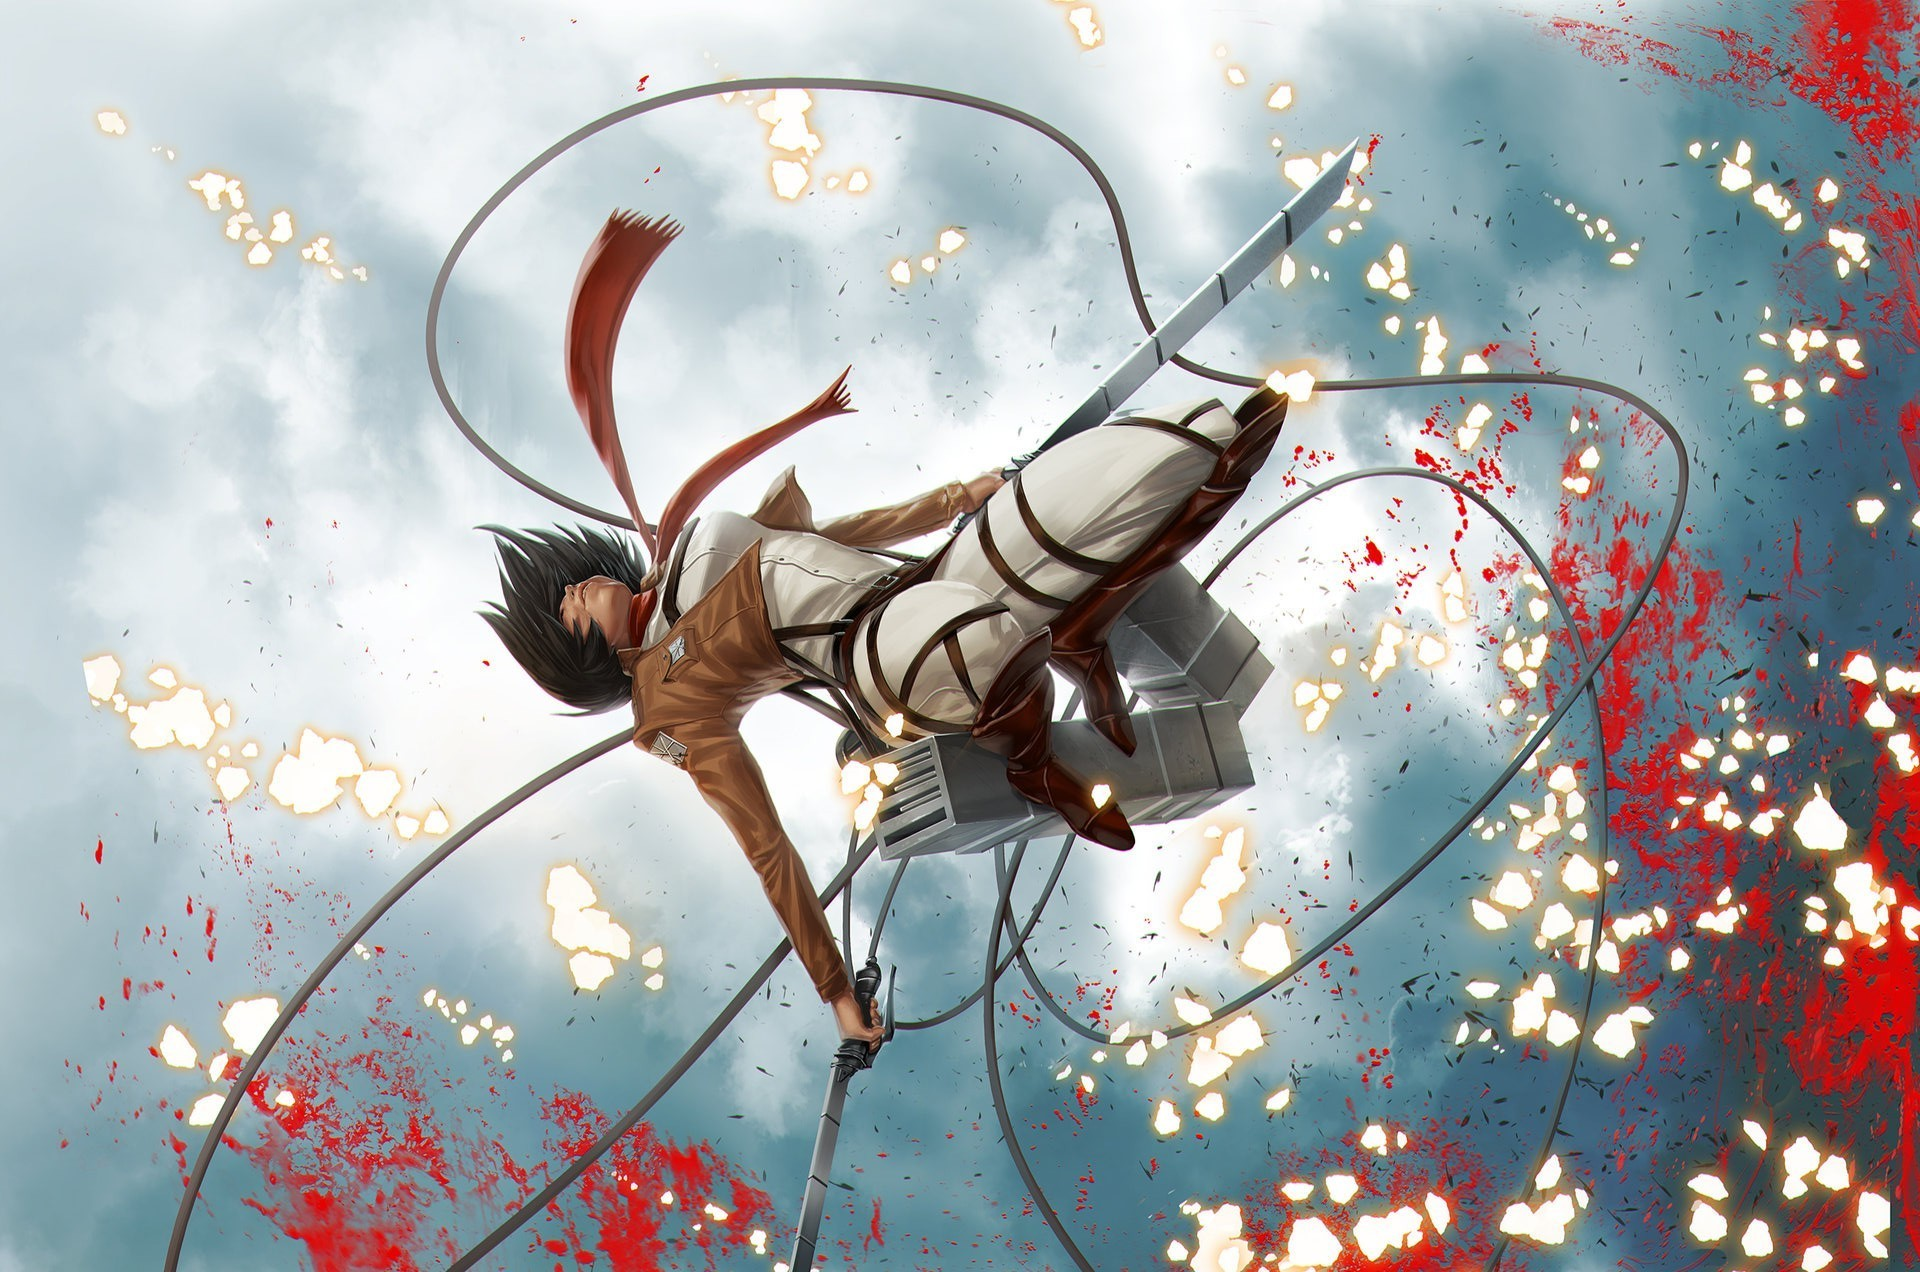 Attack On Titan Mikasa Ackerman Wallpapers (82+ Images